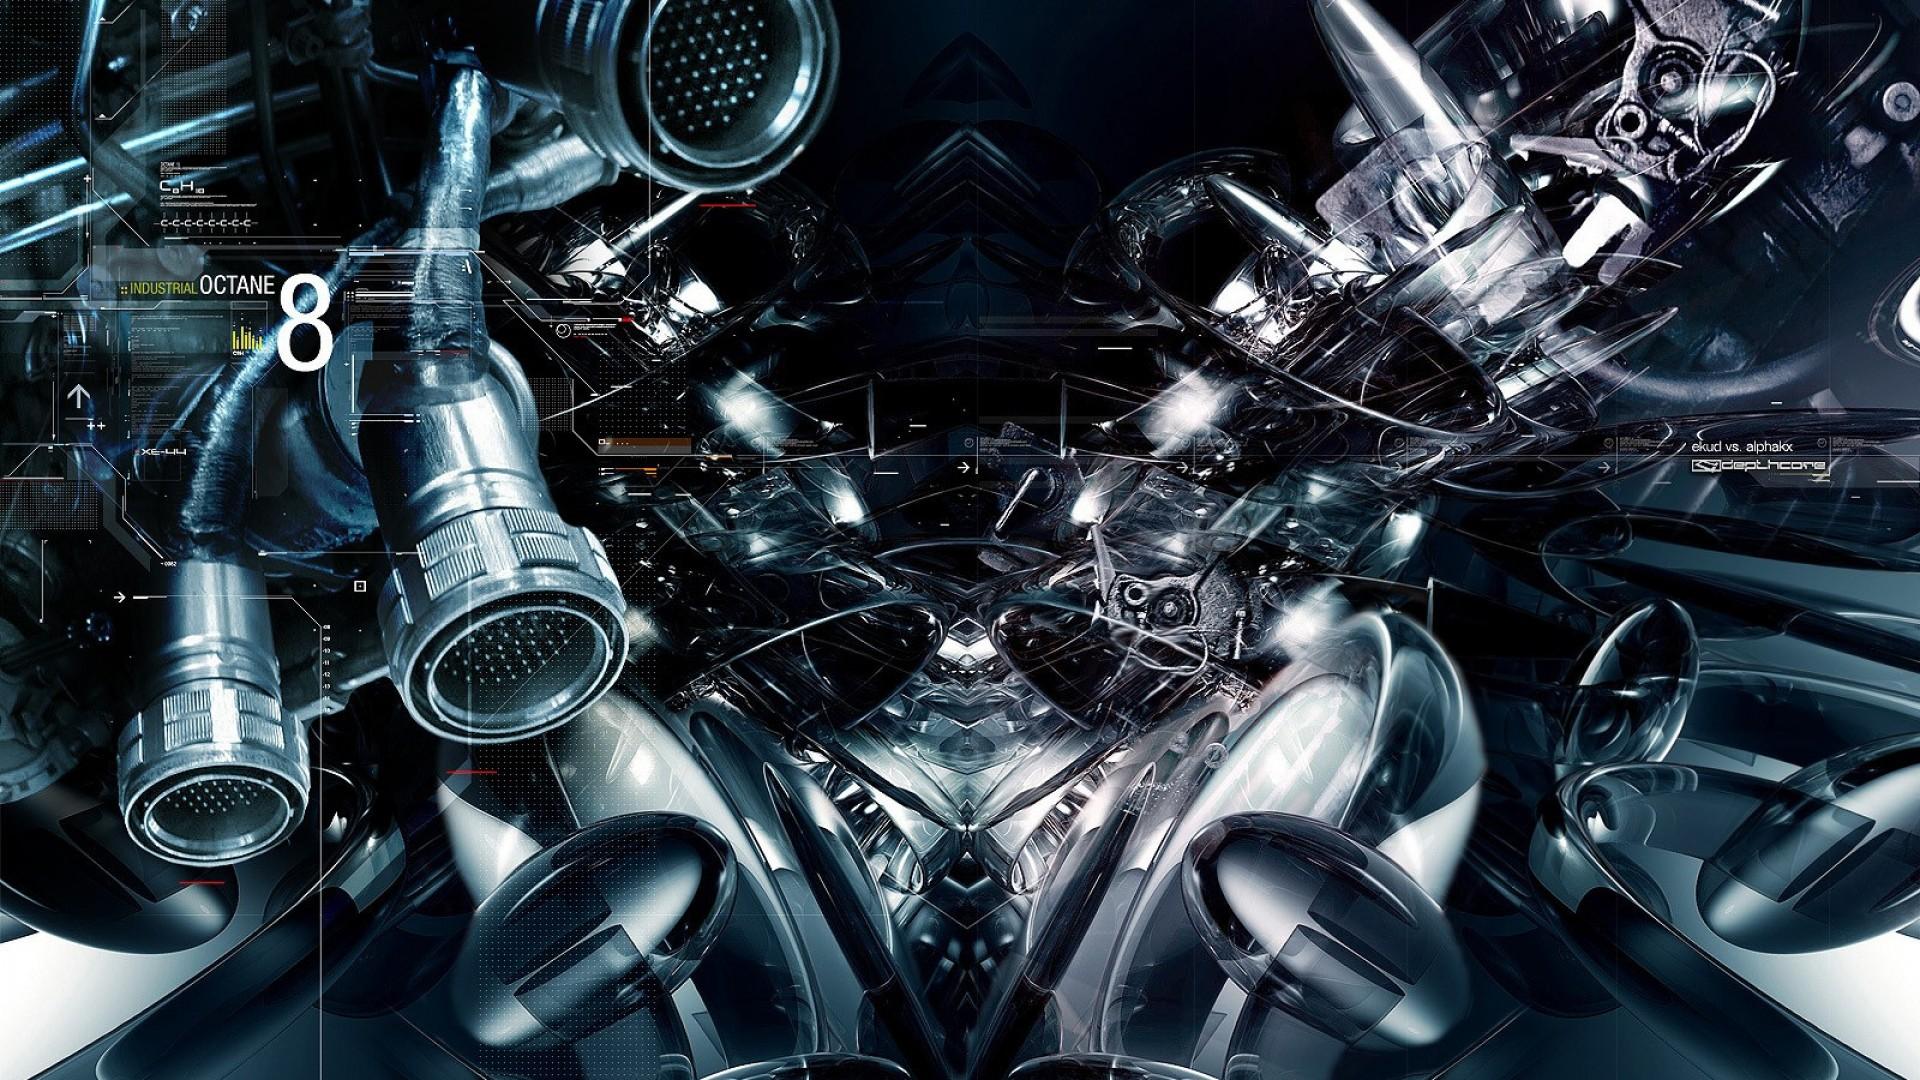 Machine px| HD Pics